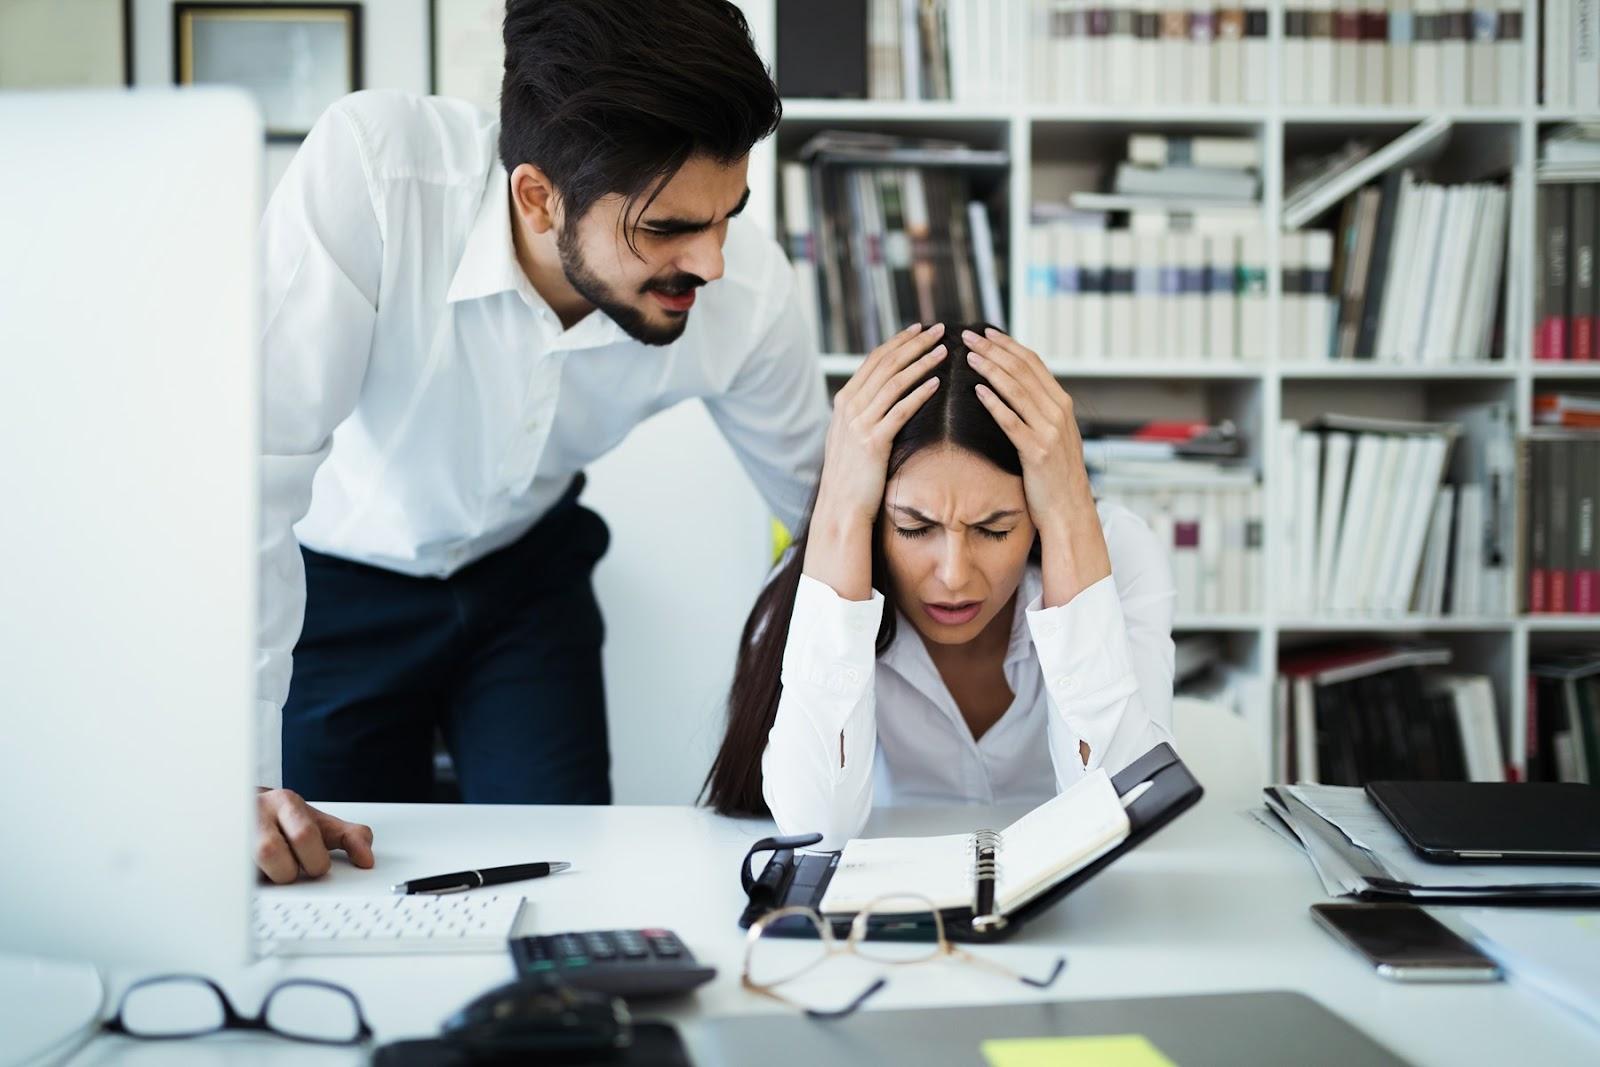 [angry-irritated-boss-reprimanding-employee-afraid-KYMZLNS%5B5%5D]